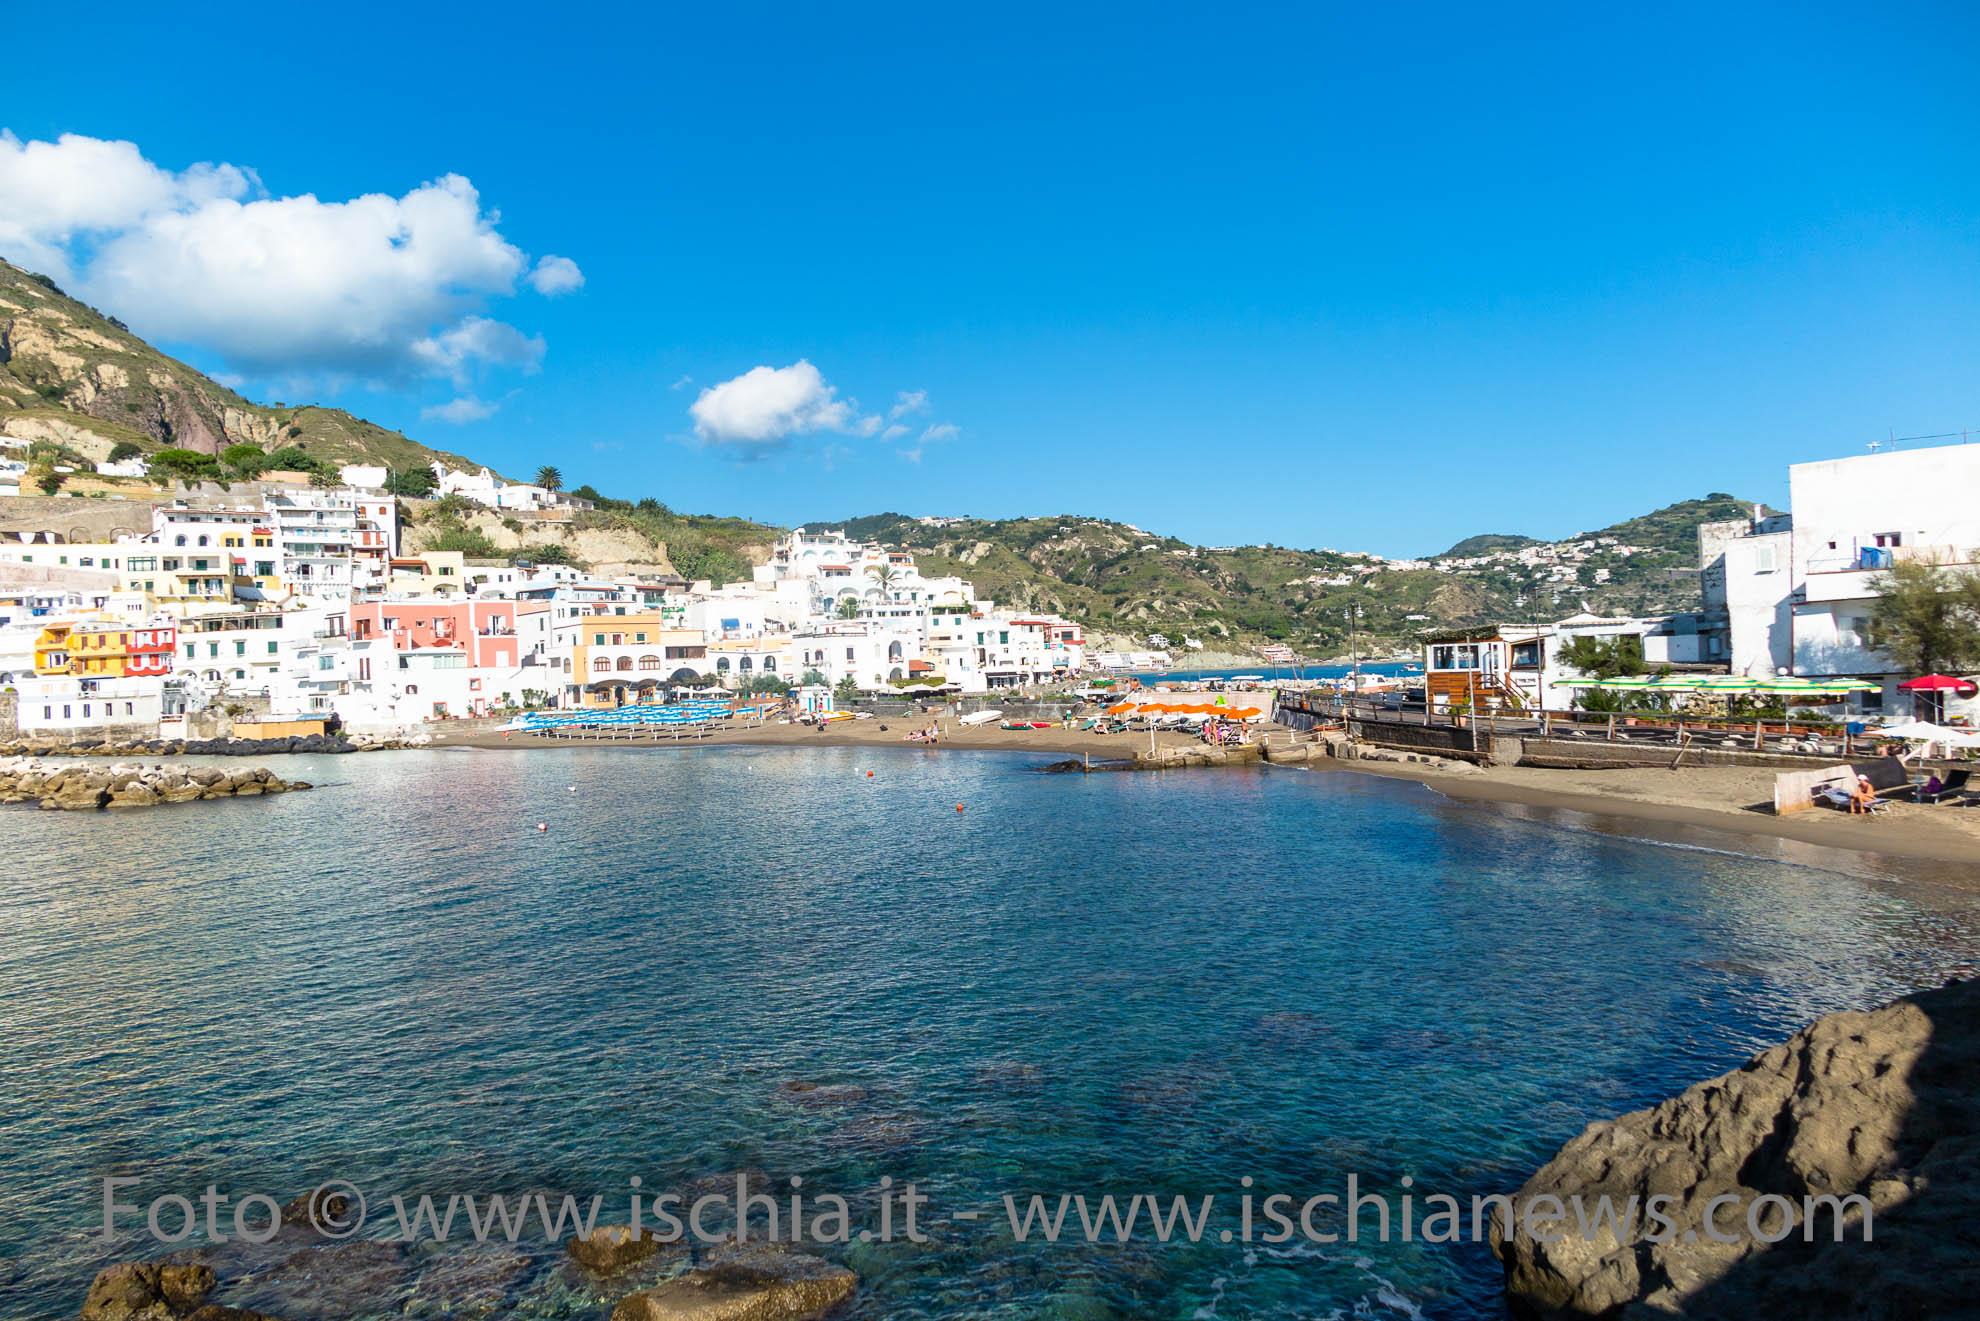 Ischia.it - offerte e lastminute